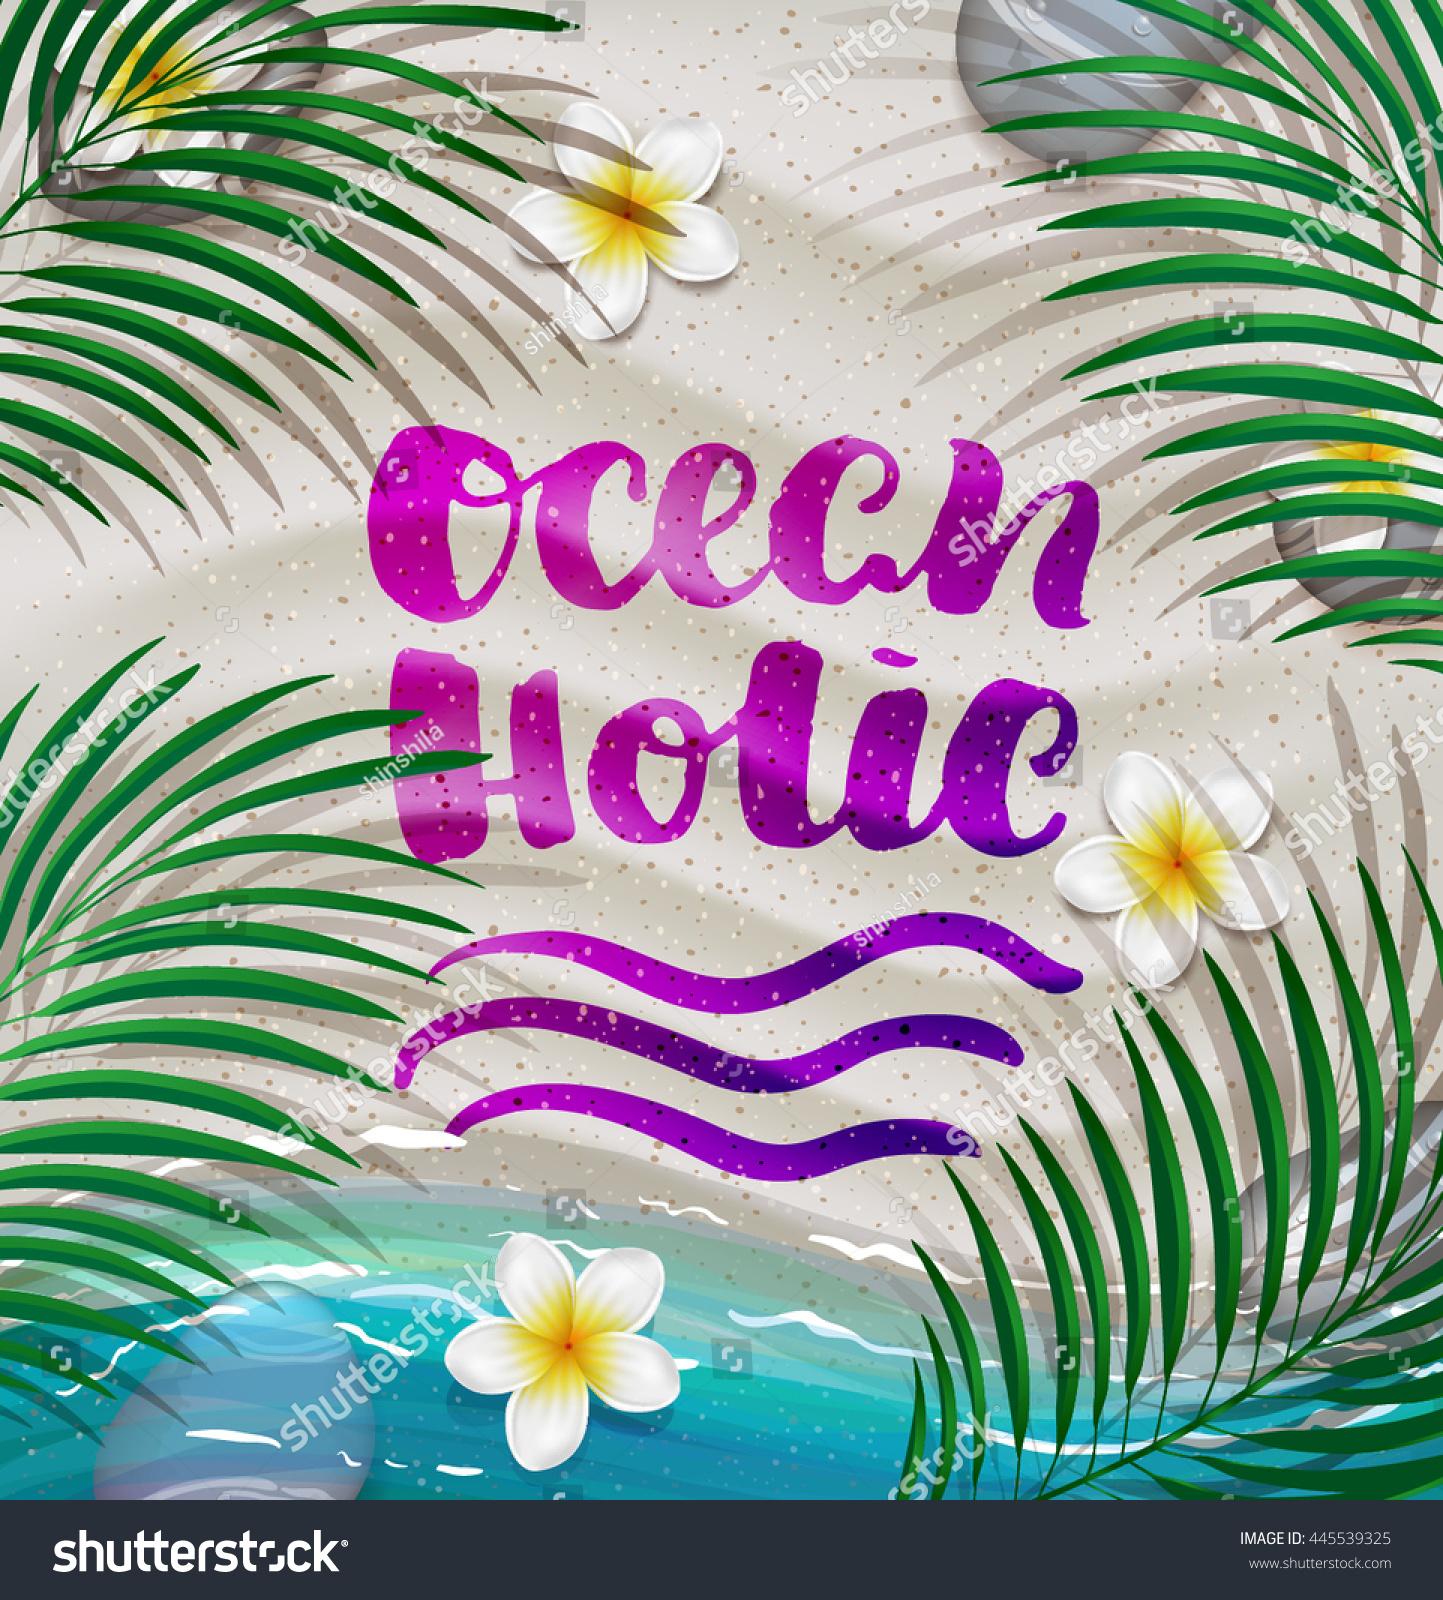 C Stock Quote Hand Drawn Calligraphy Ocean Holic C Stock Vector 445539325